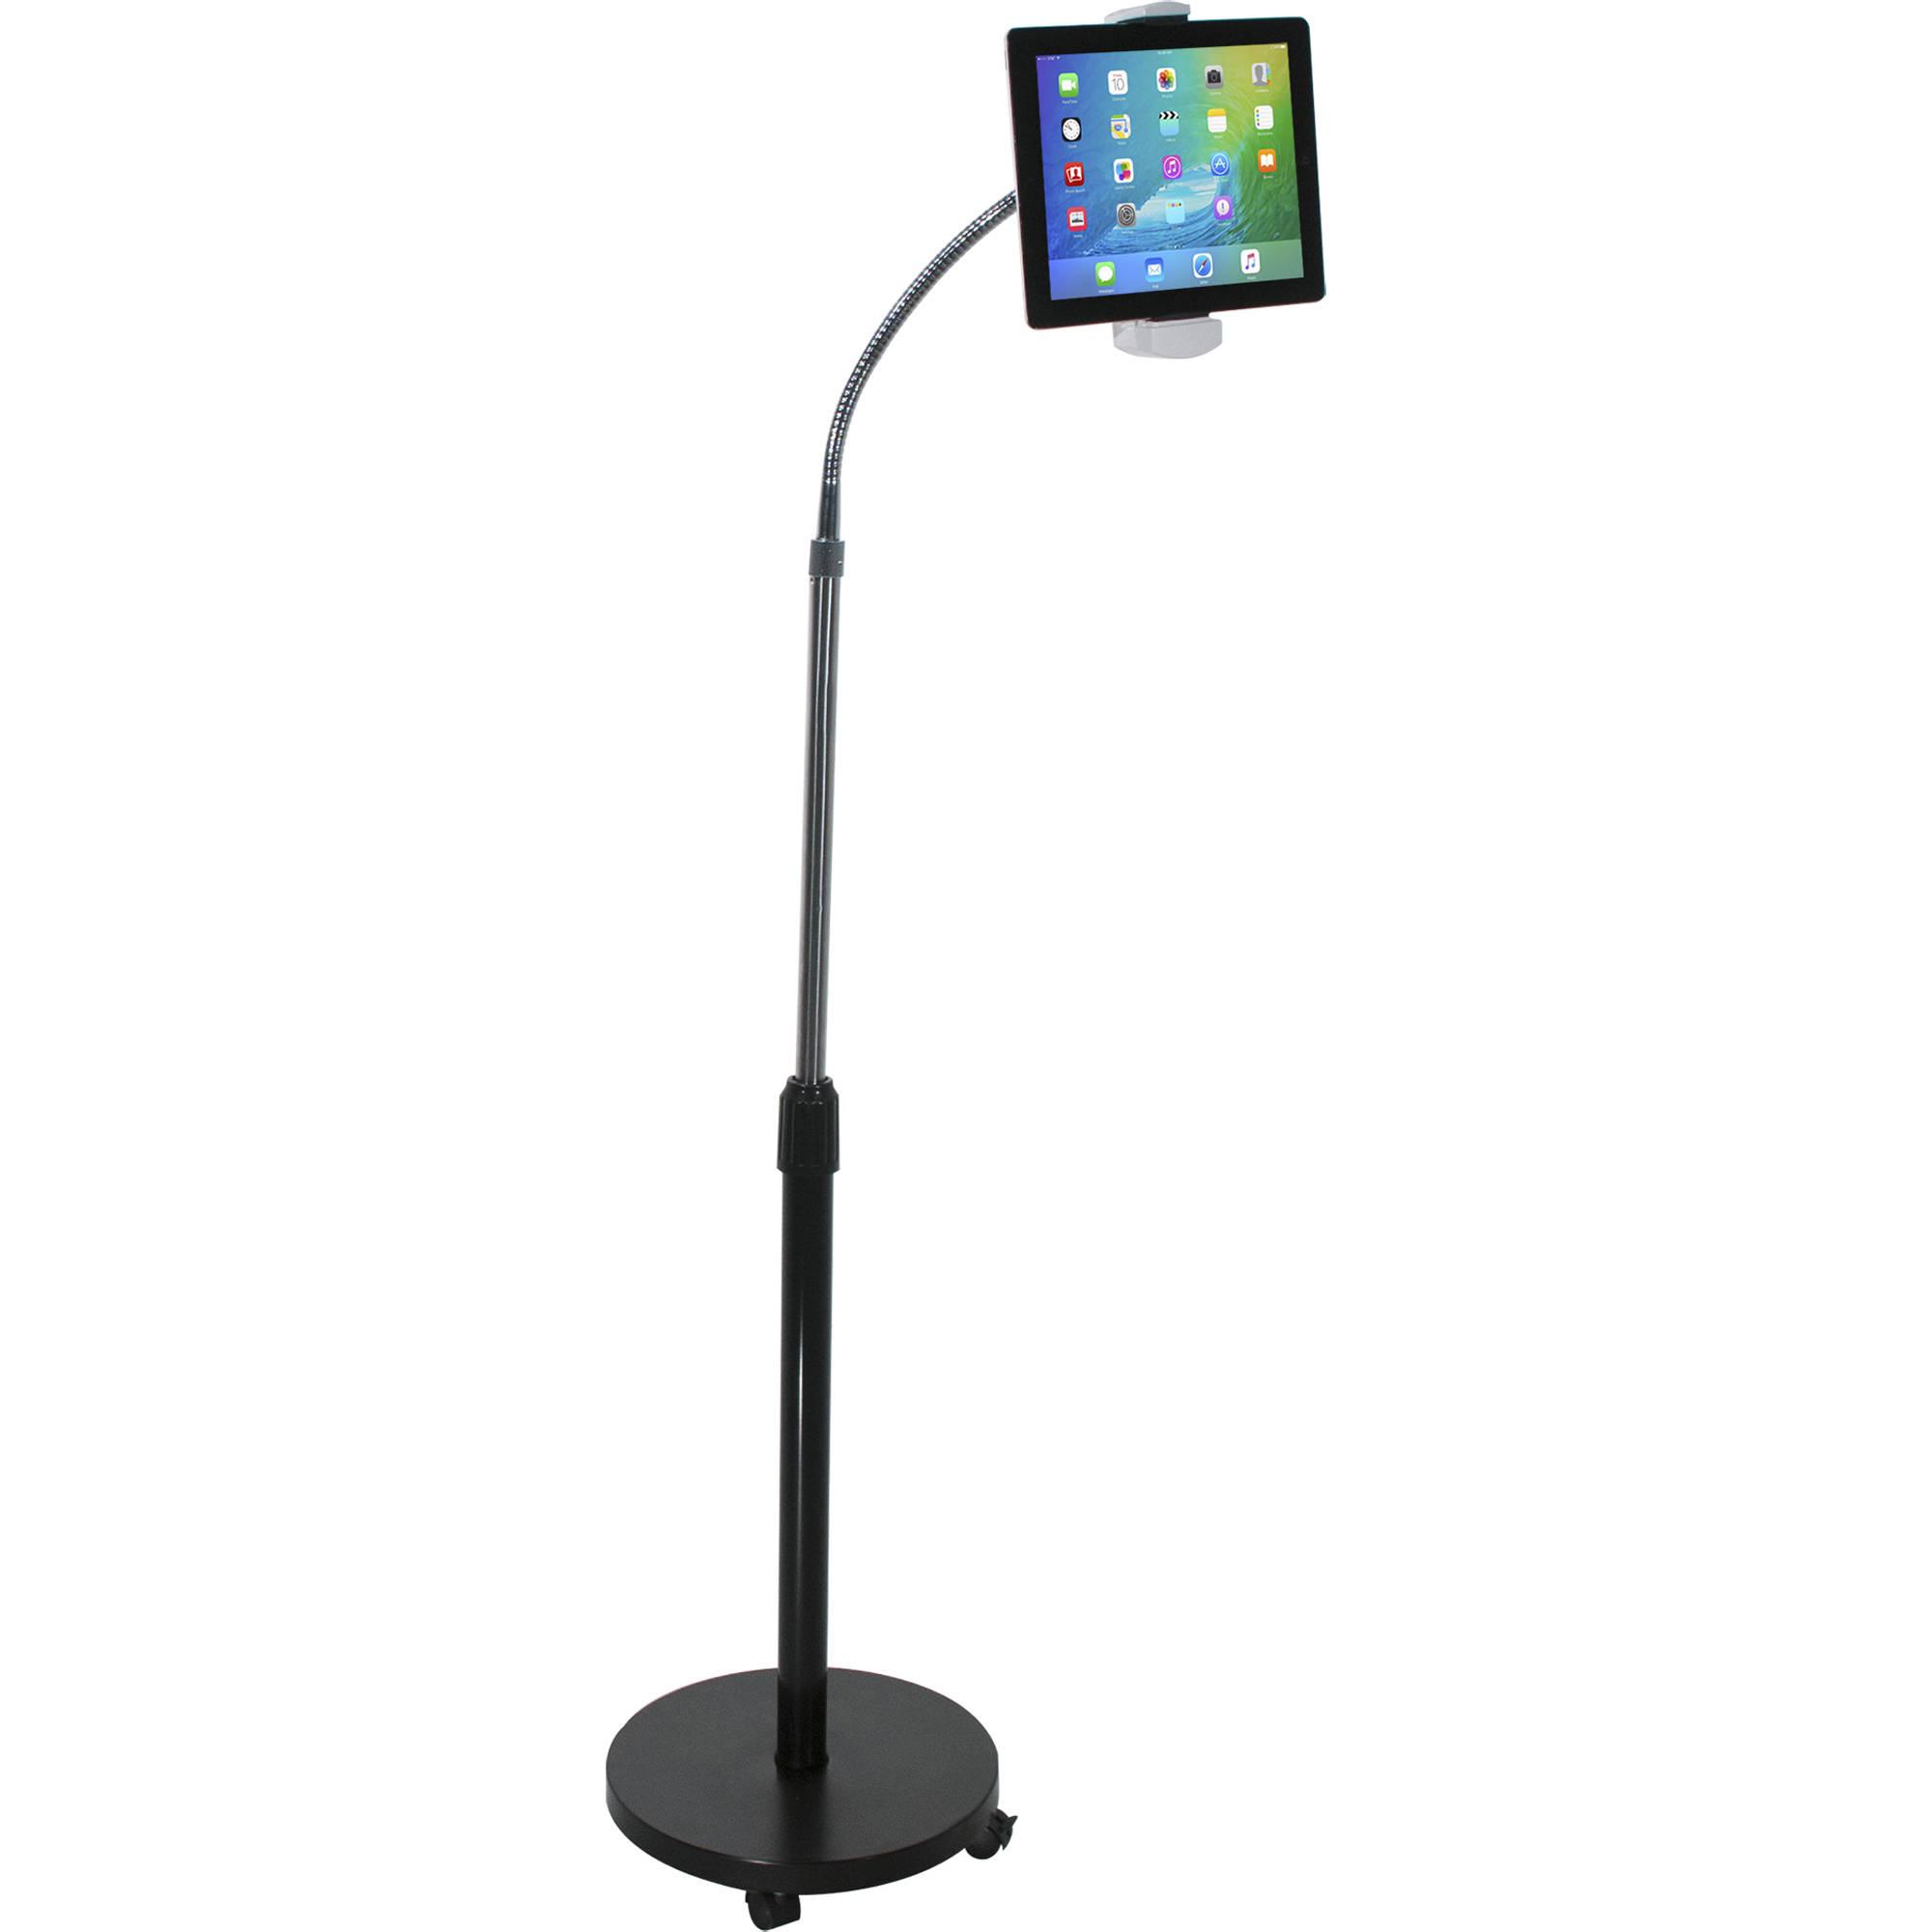 Cta digital gooseneck floor stand for tablets pad gfs bh photo tablet or ipad not included tyukafo